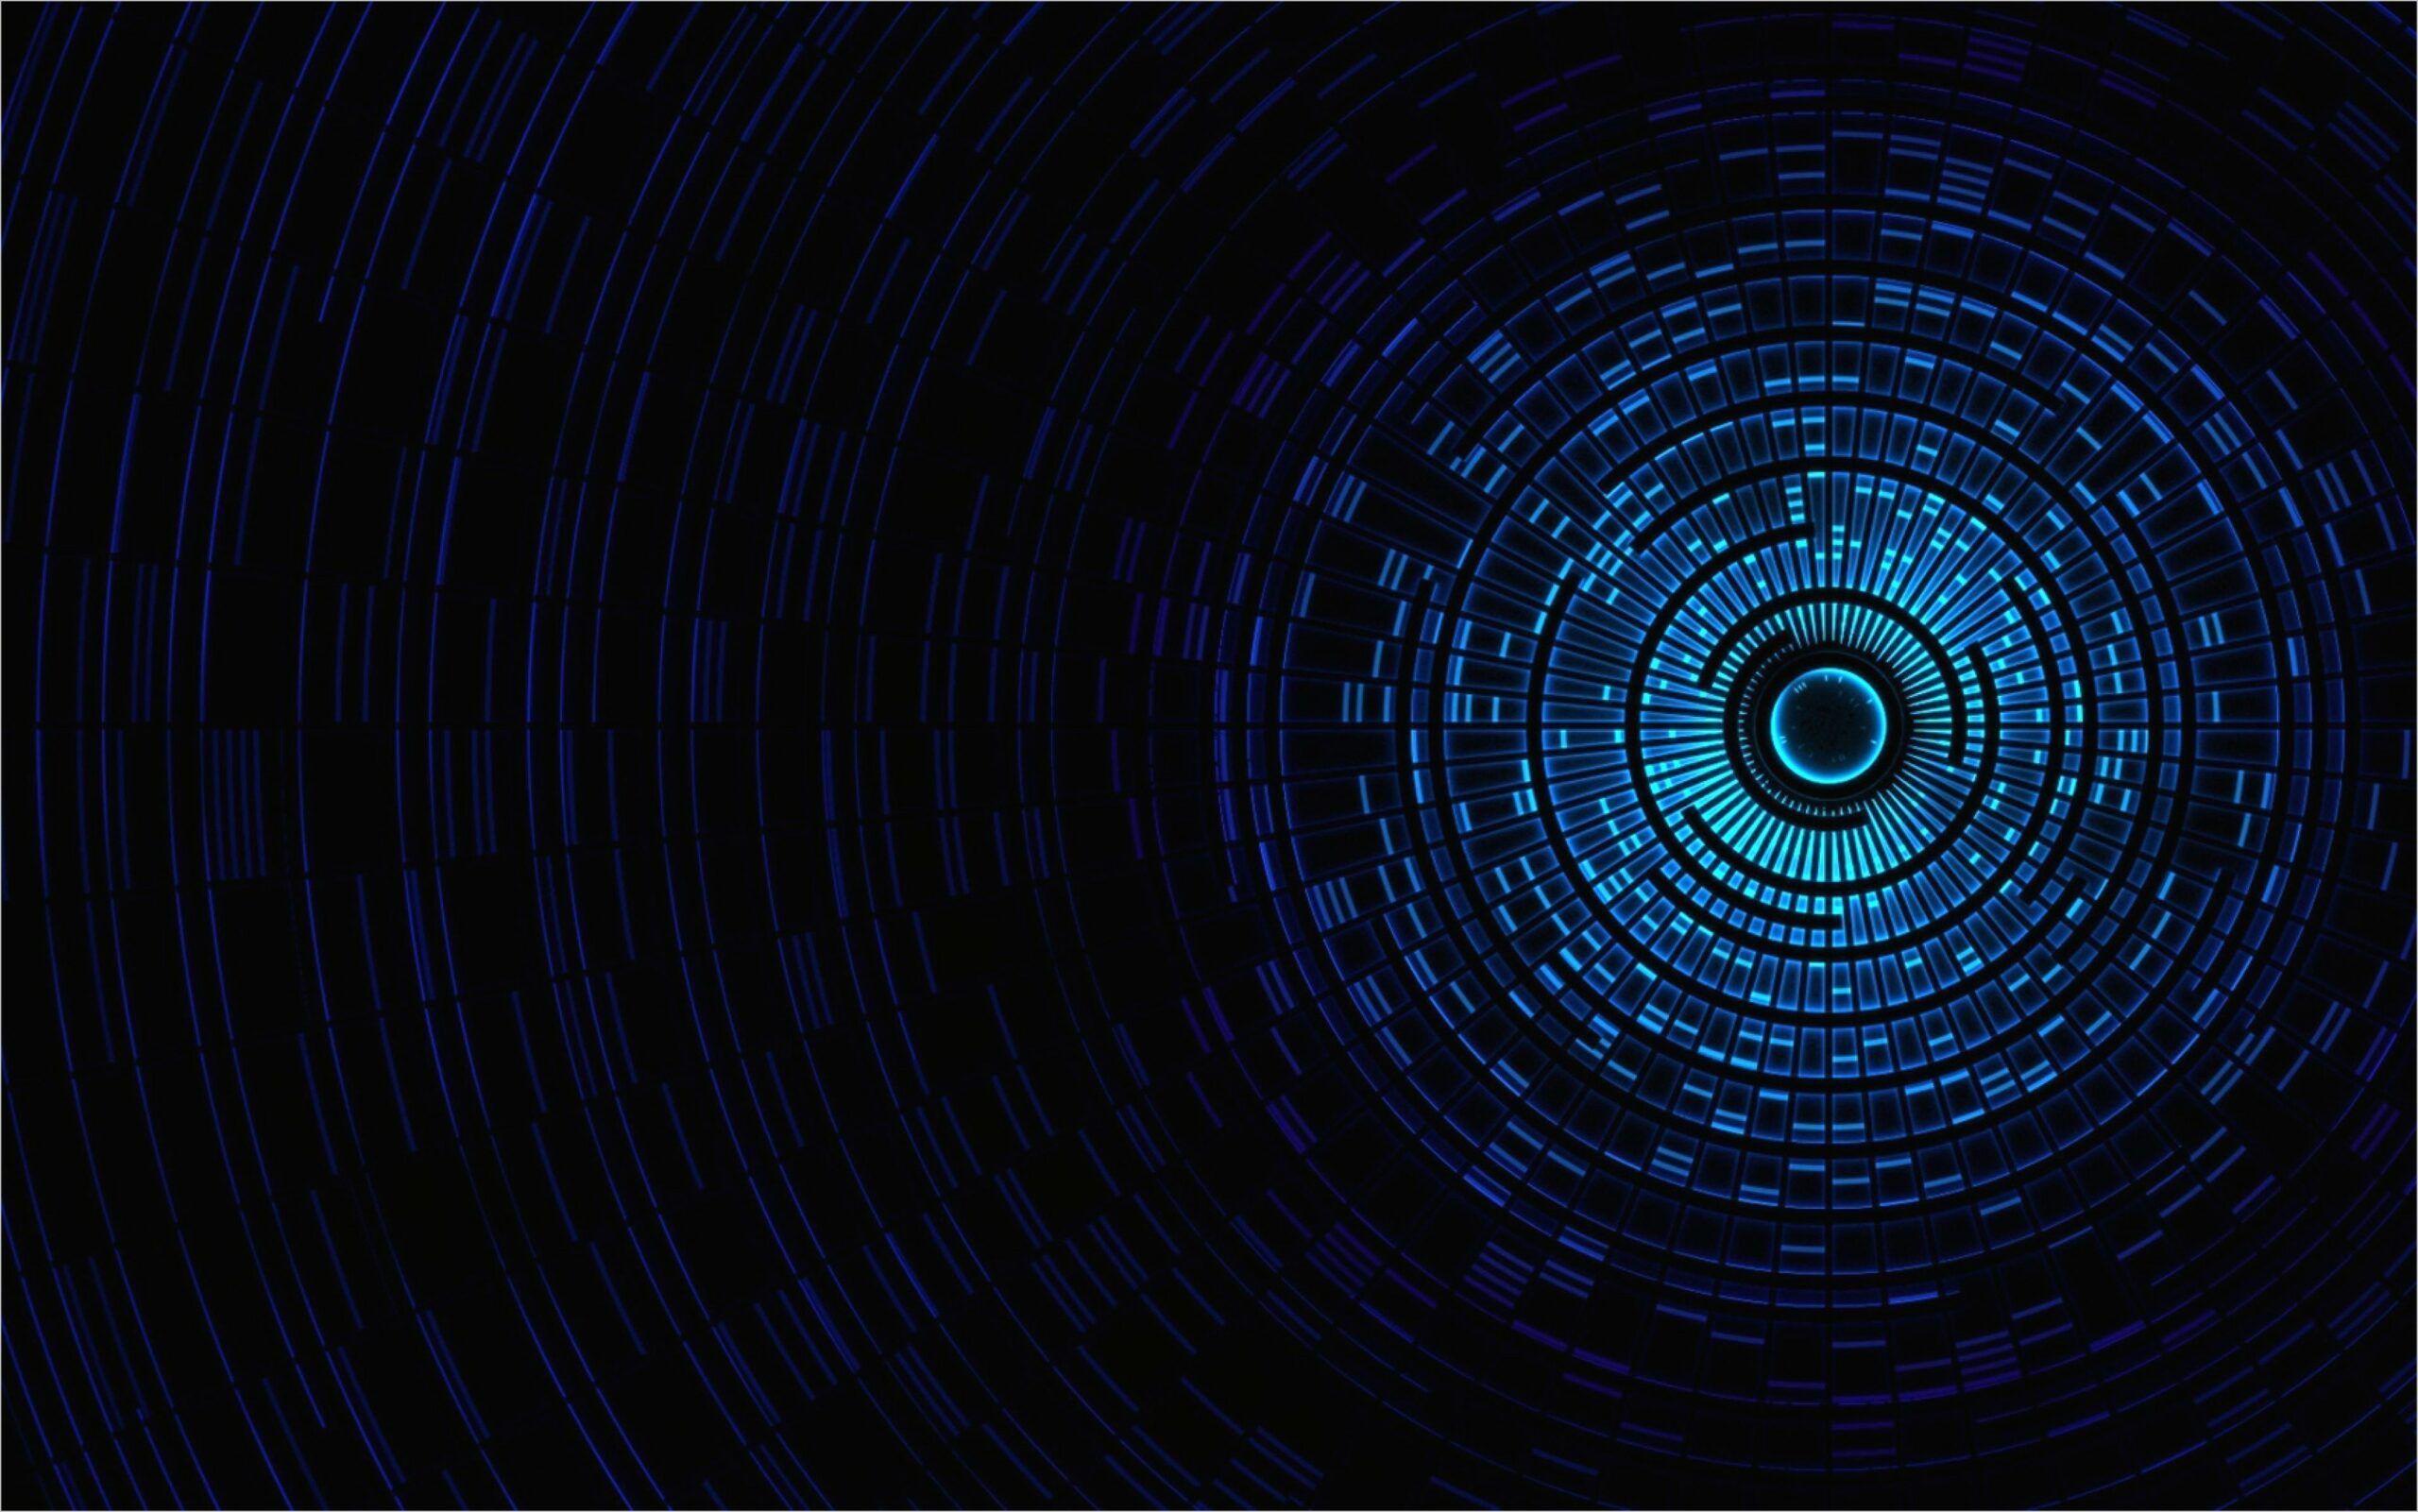 4k Wallpaper For Pc Dark In 2020 4k Wallpapers For Pc Black And Blue Wallpaper Dark Blue Wallpaper